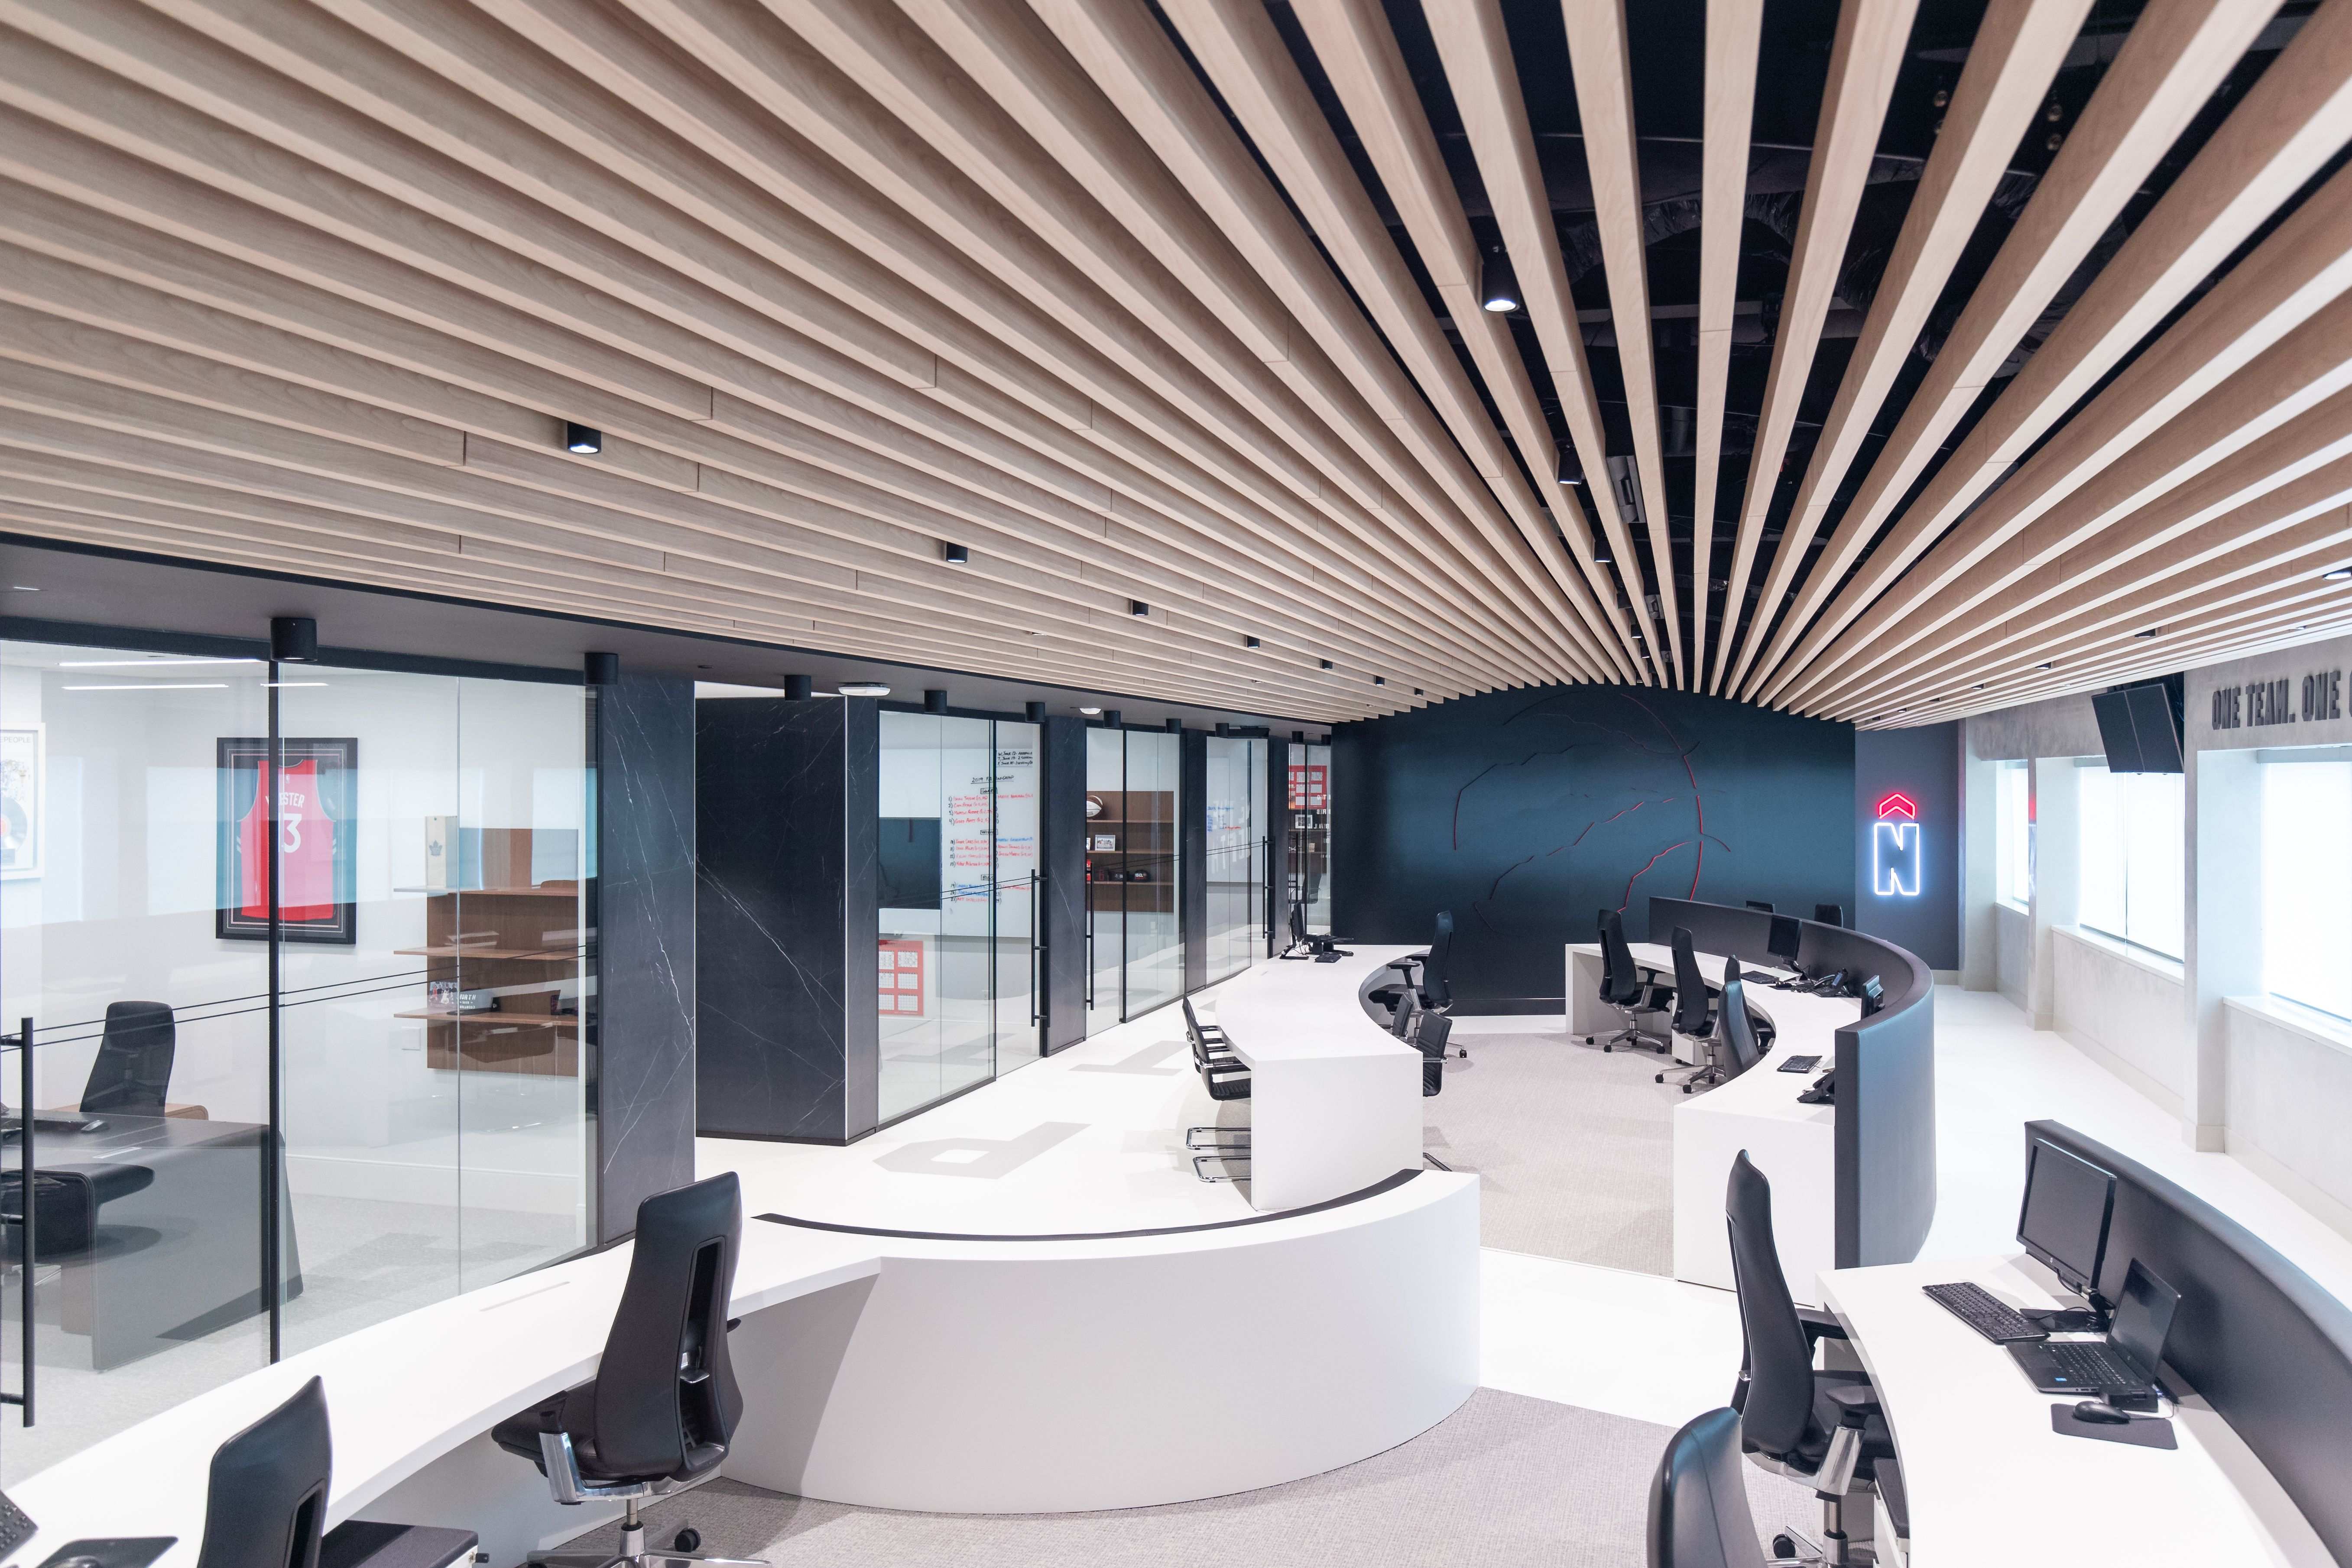 Project Ovo Athletic Centre Toronto On Design Straticom